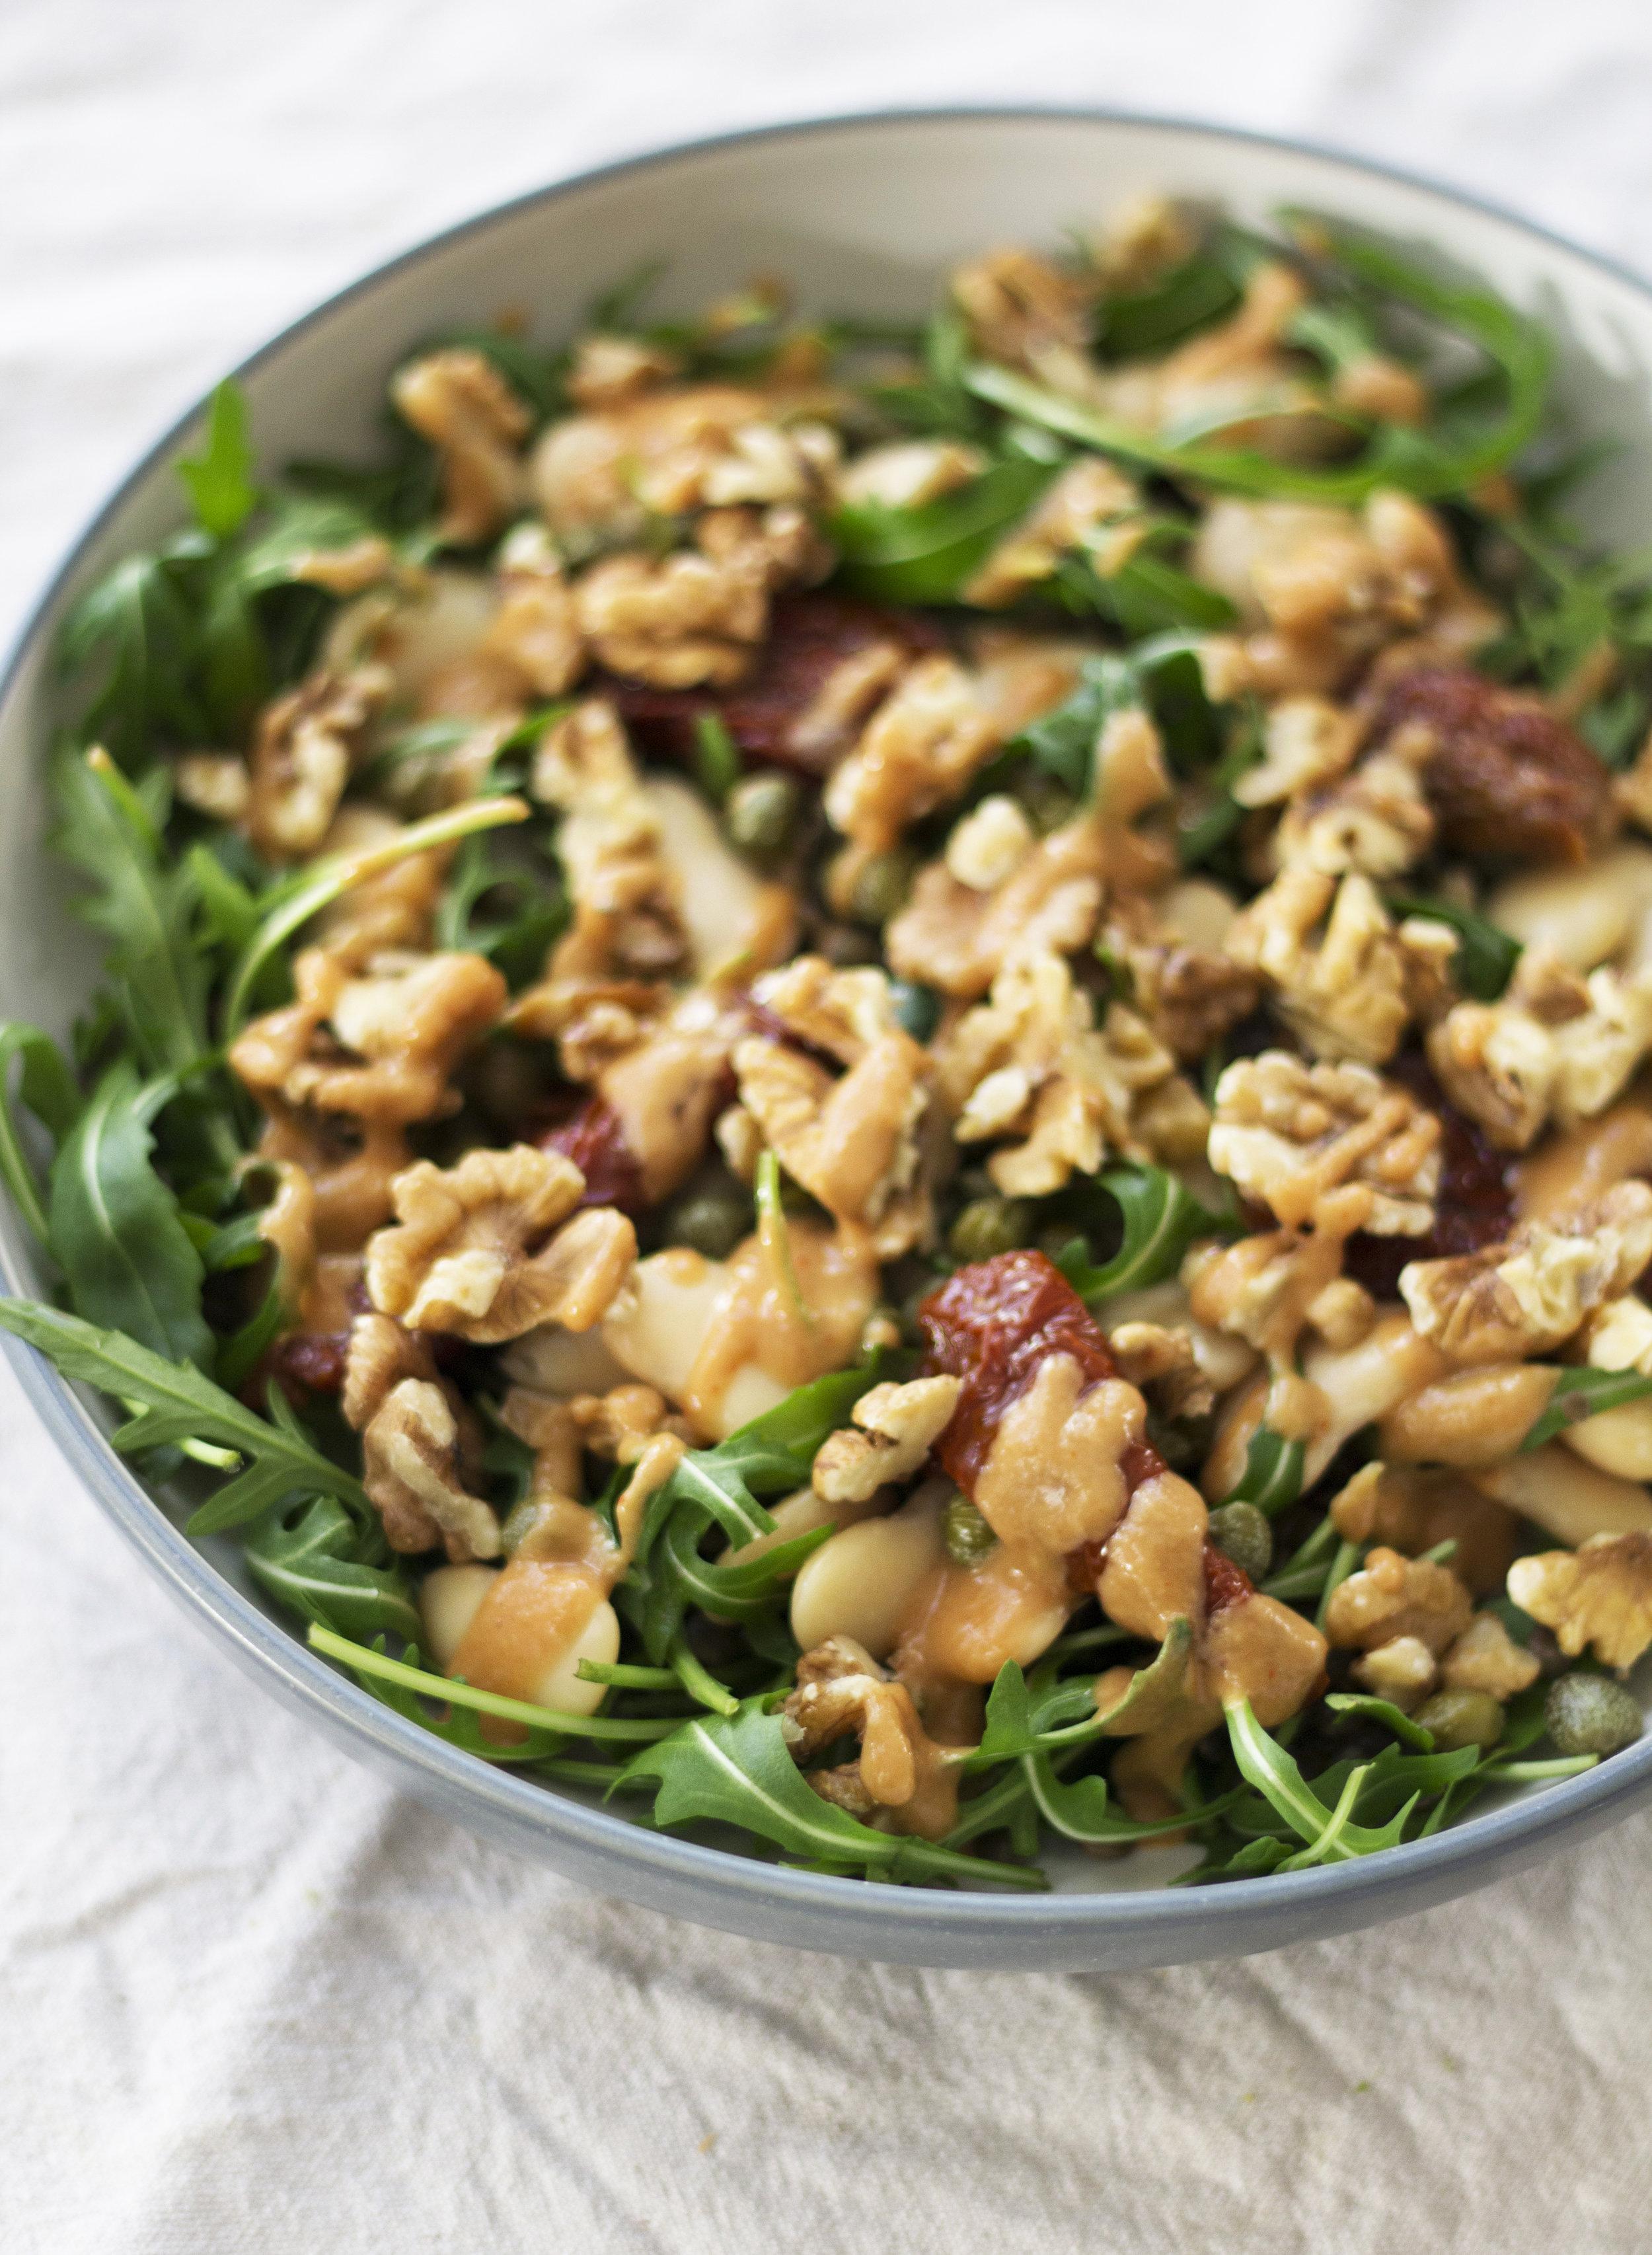 This filling summer salad packs 45g of protein! - prep time5 mins  total time 25 mins  serves 1-2